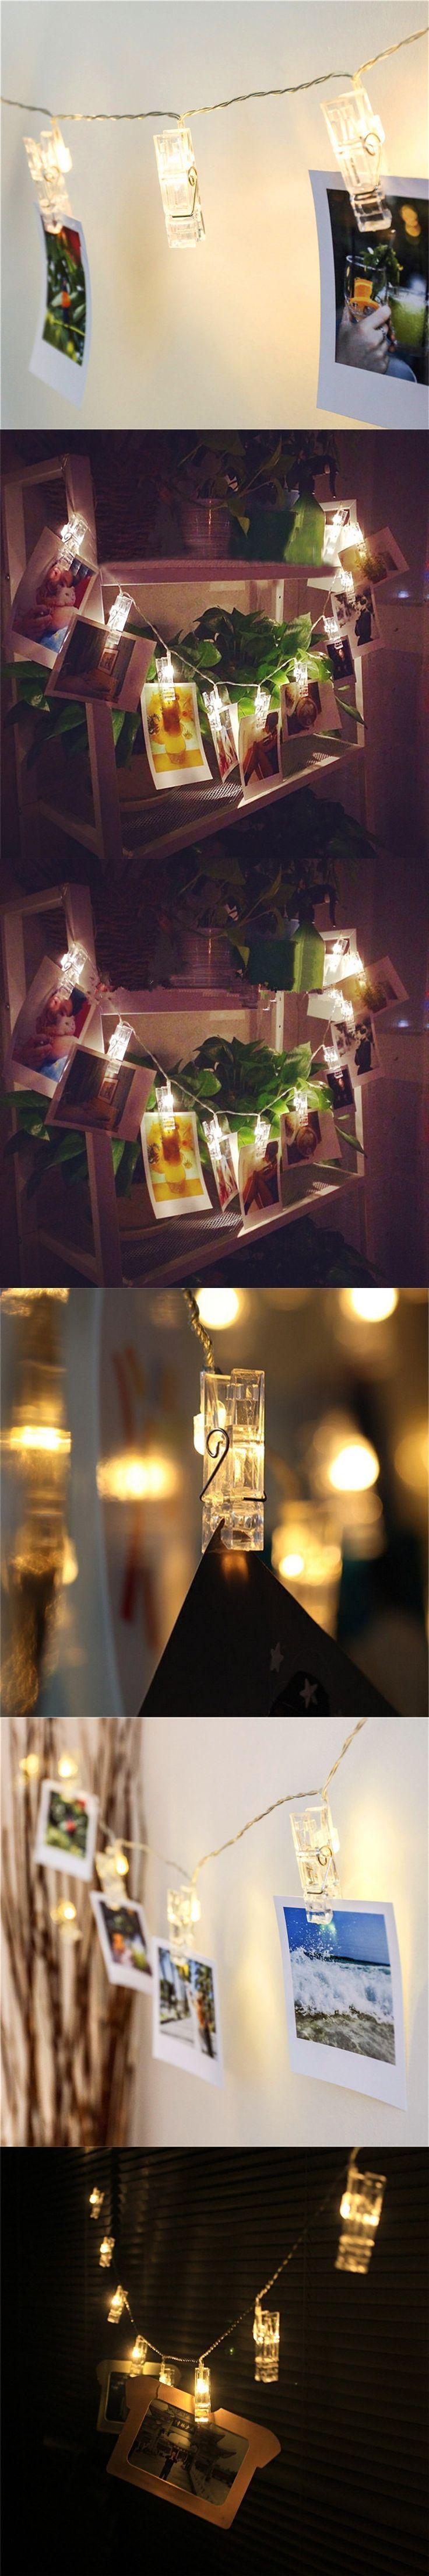 1X 1m/2m/3m/4m Led Photo Clip String Light, Battery-powered LED Card Photo clip string lights 3xAA battery Christmas lights